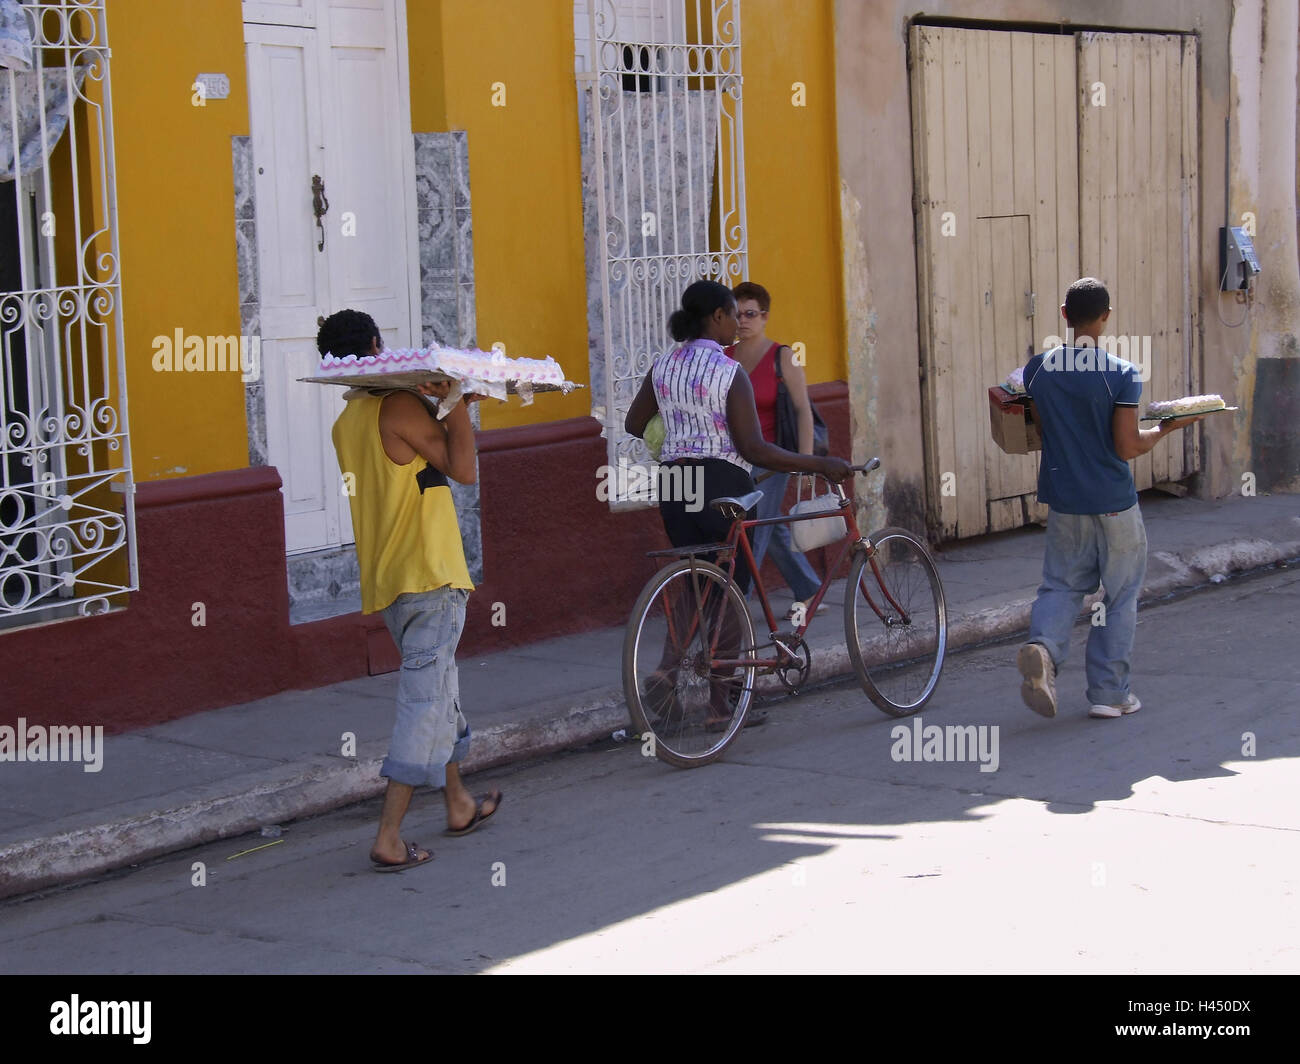 Strassenszene Manner Carry Kuchen Trinidad Kuba Urlaub